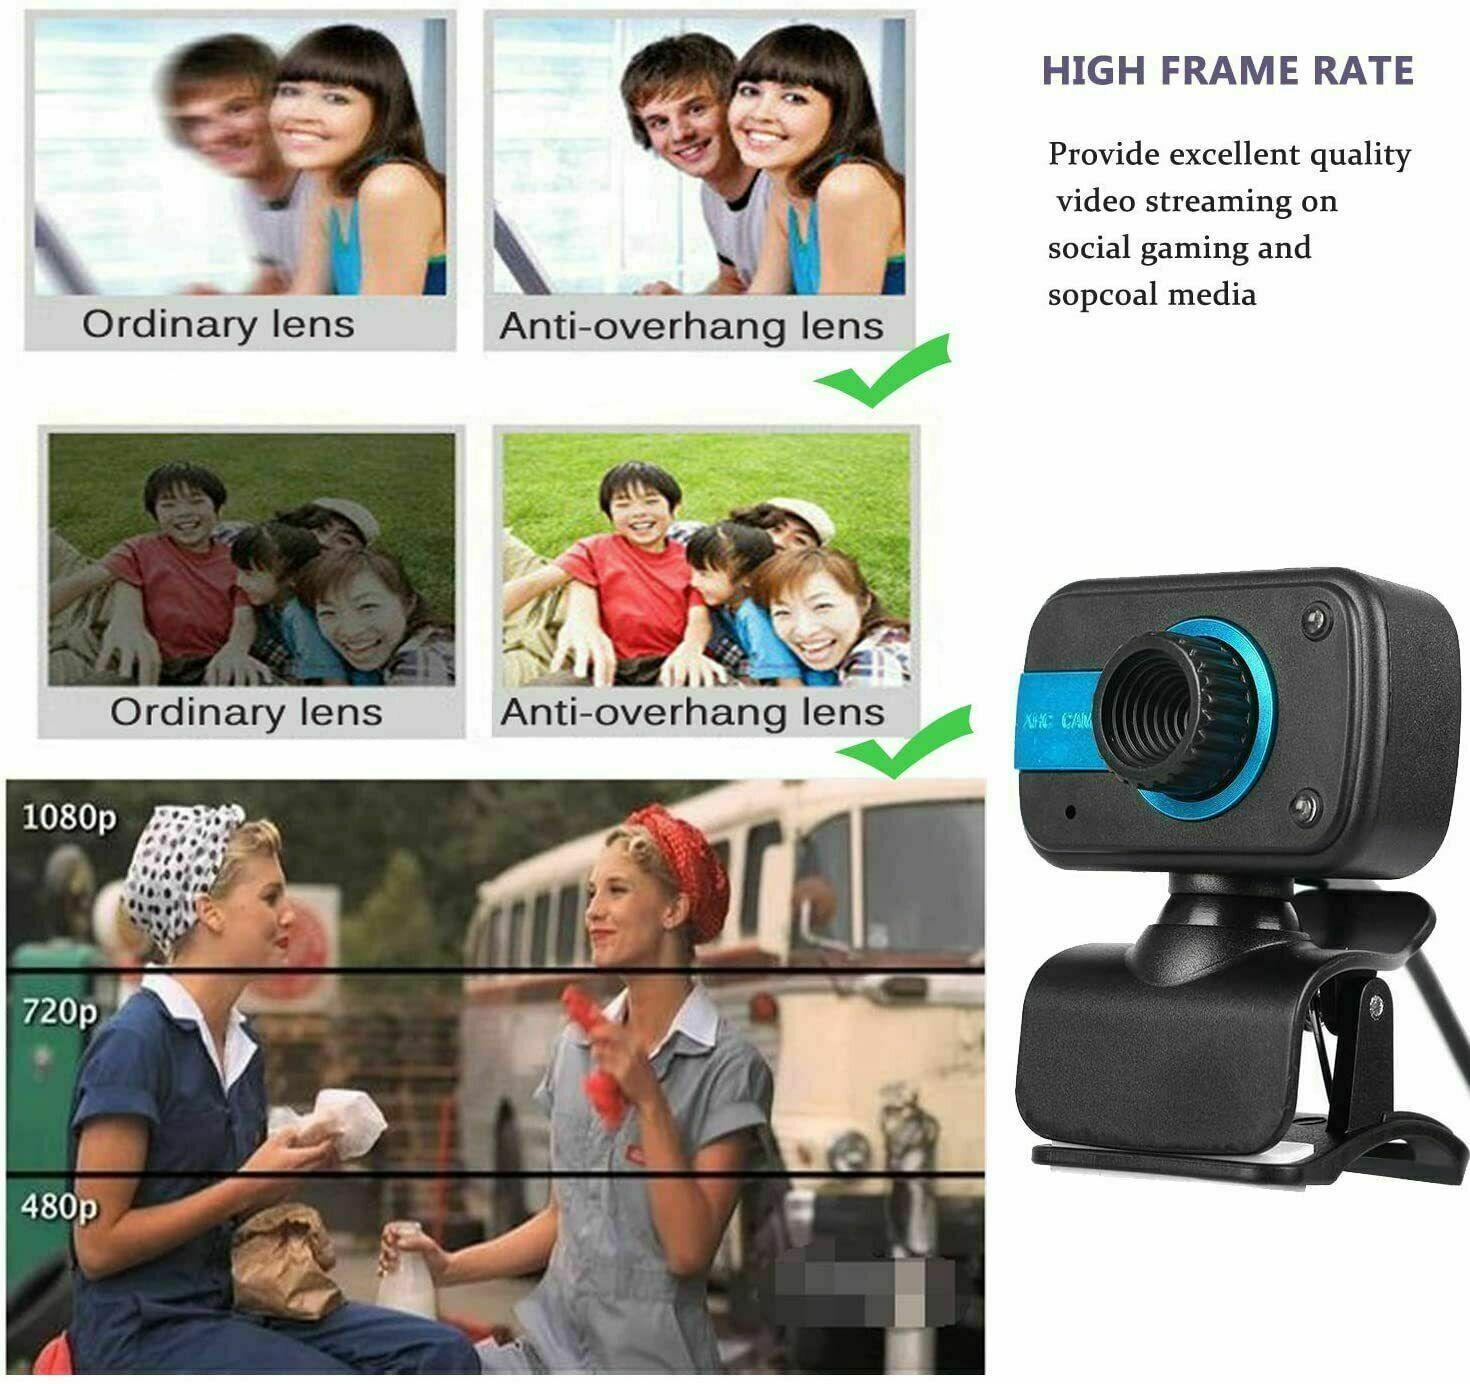 HD Webcam USB Computer Web Camera For PC Laptop Desktop Video Cam W Microphone